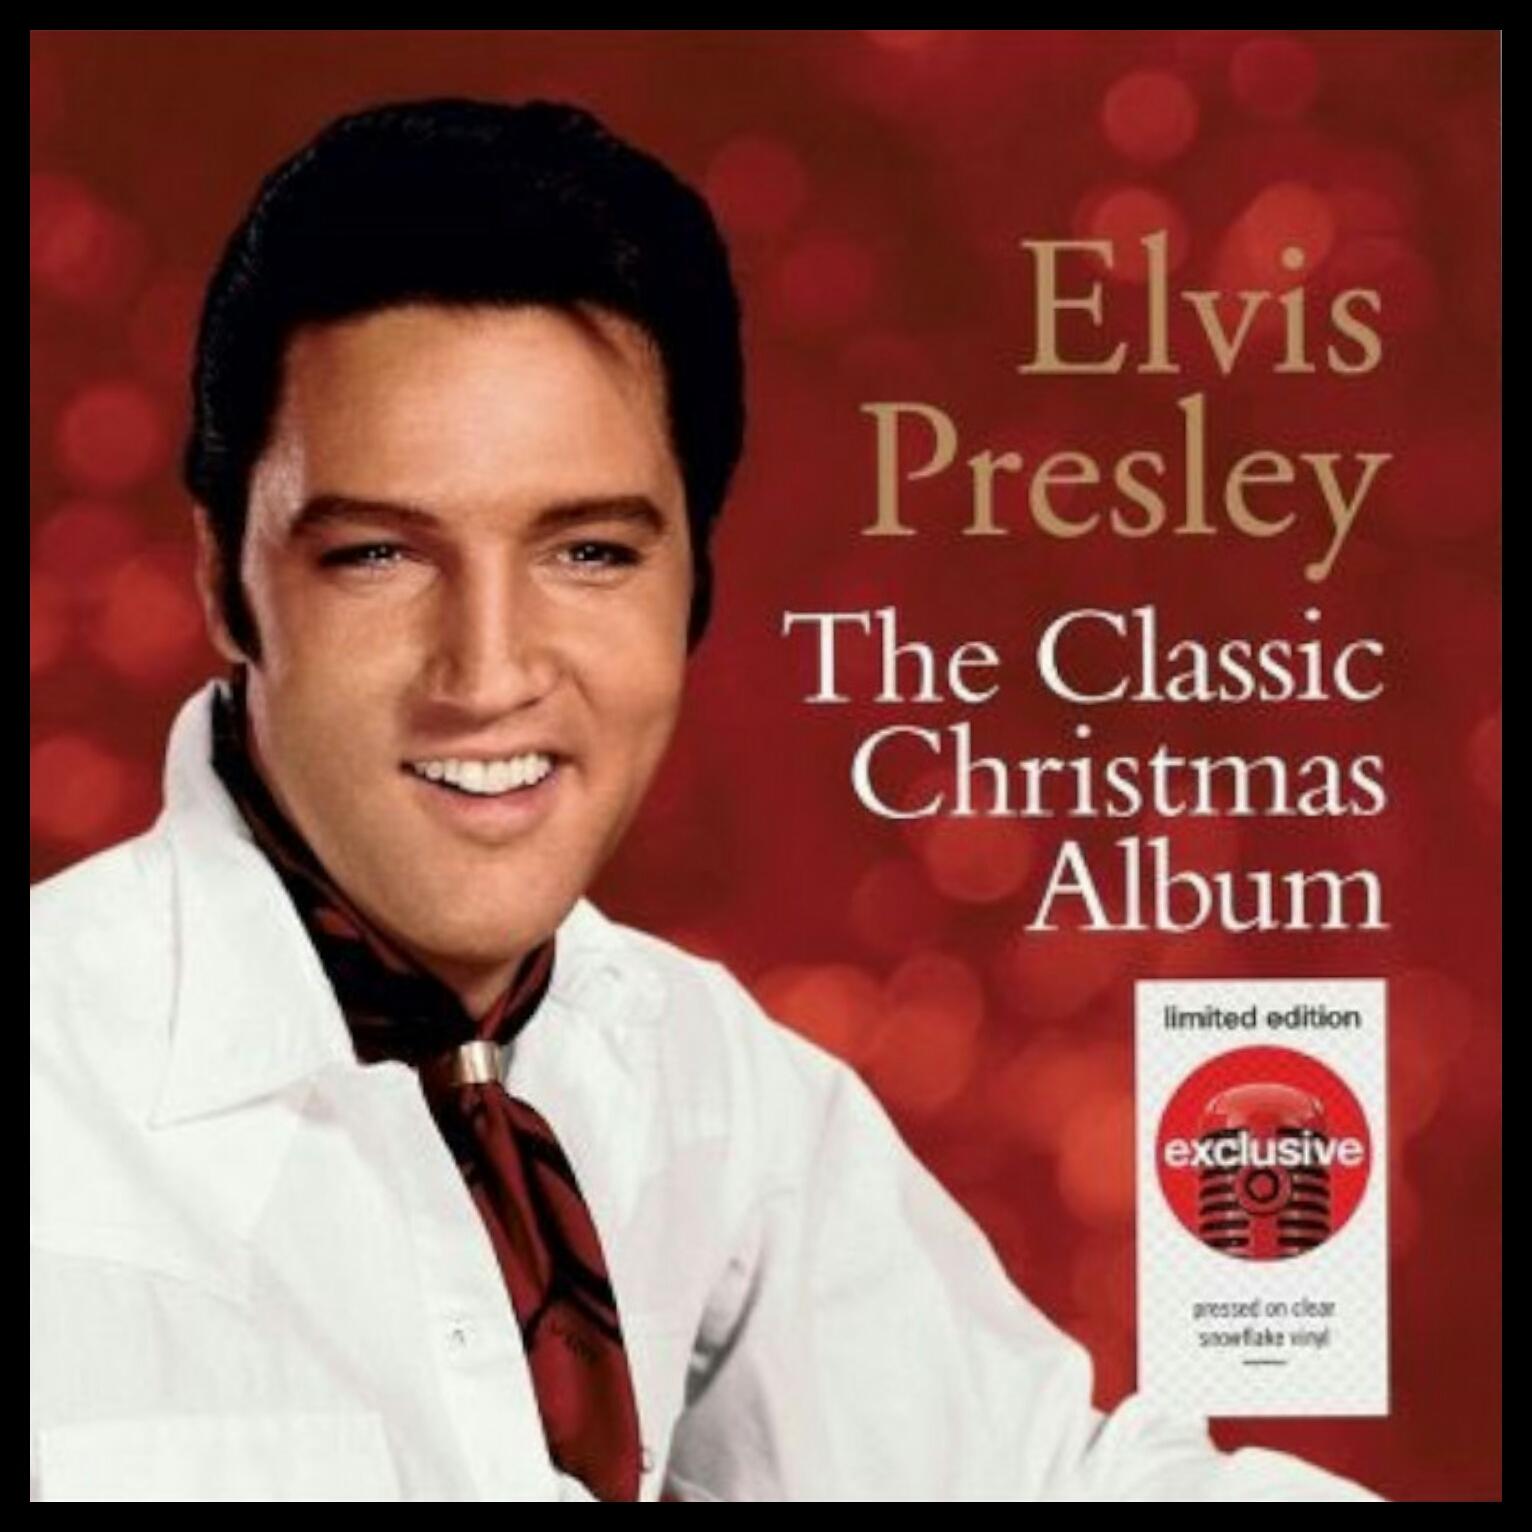 ELVIS PRESLEY - THE CLASSIC CHRISTMAS ALBUM Elvispresley-theclass56k0m